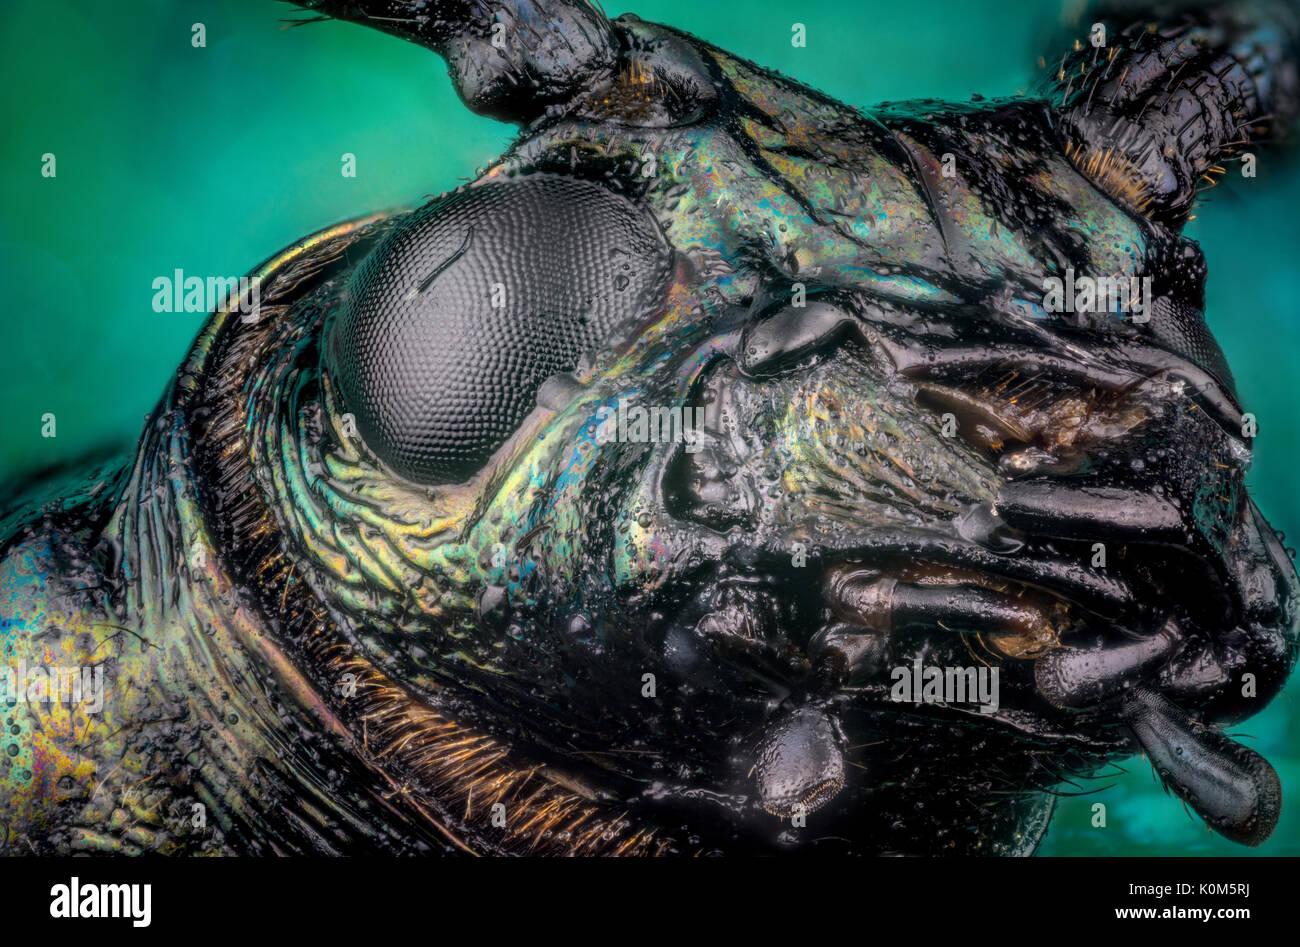 Head of ground beetle (Carabus rutilans) micro or extreme macro photography - Stock Image